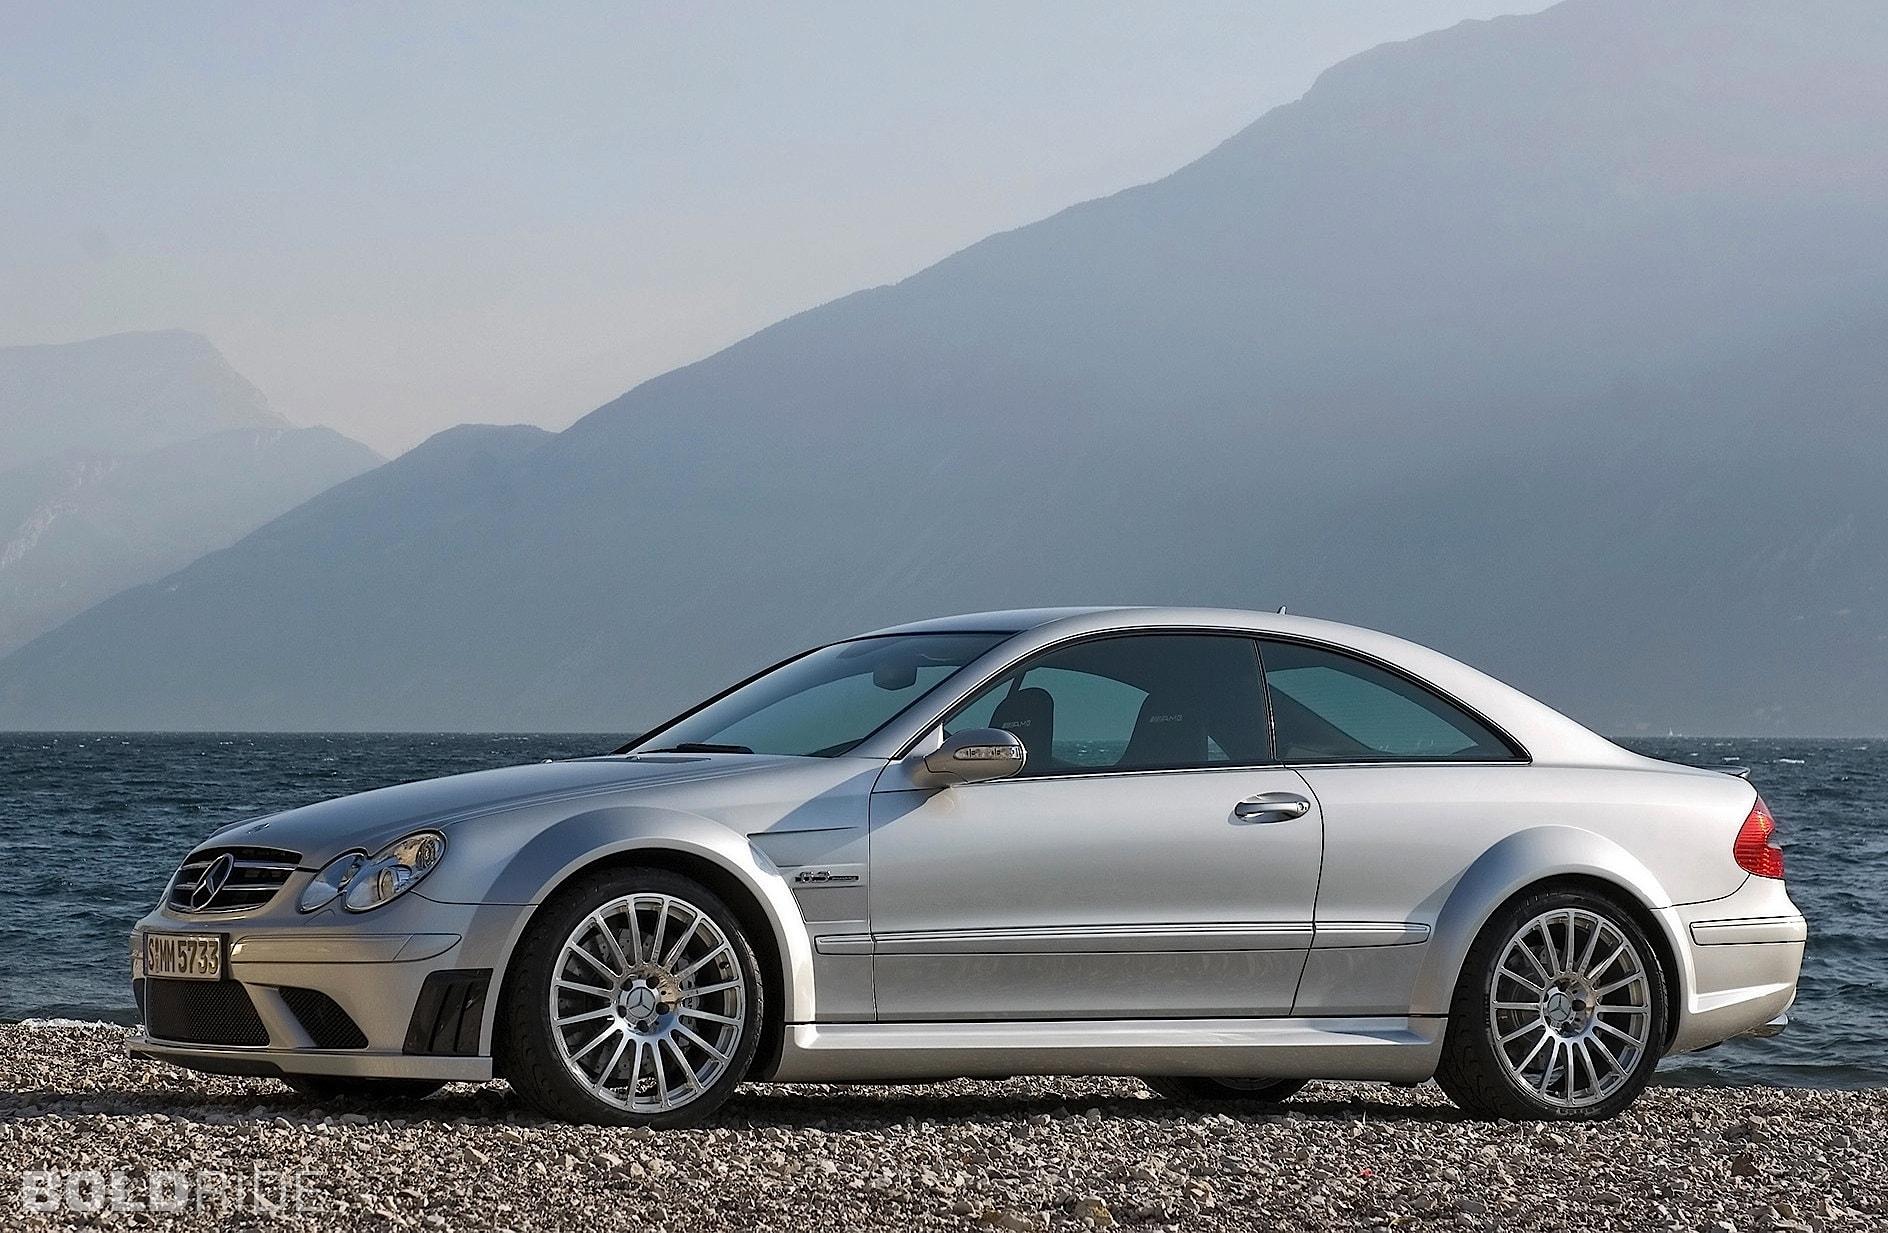 2008 Mercedes-Benz CLK63 AMG Black Series widescreen wallpapers